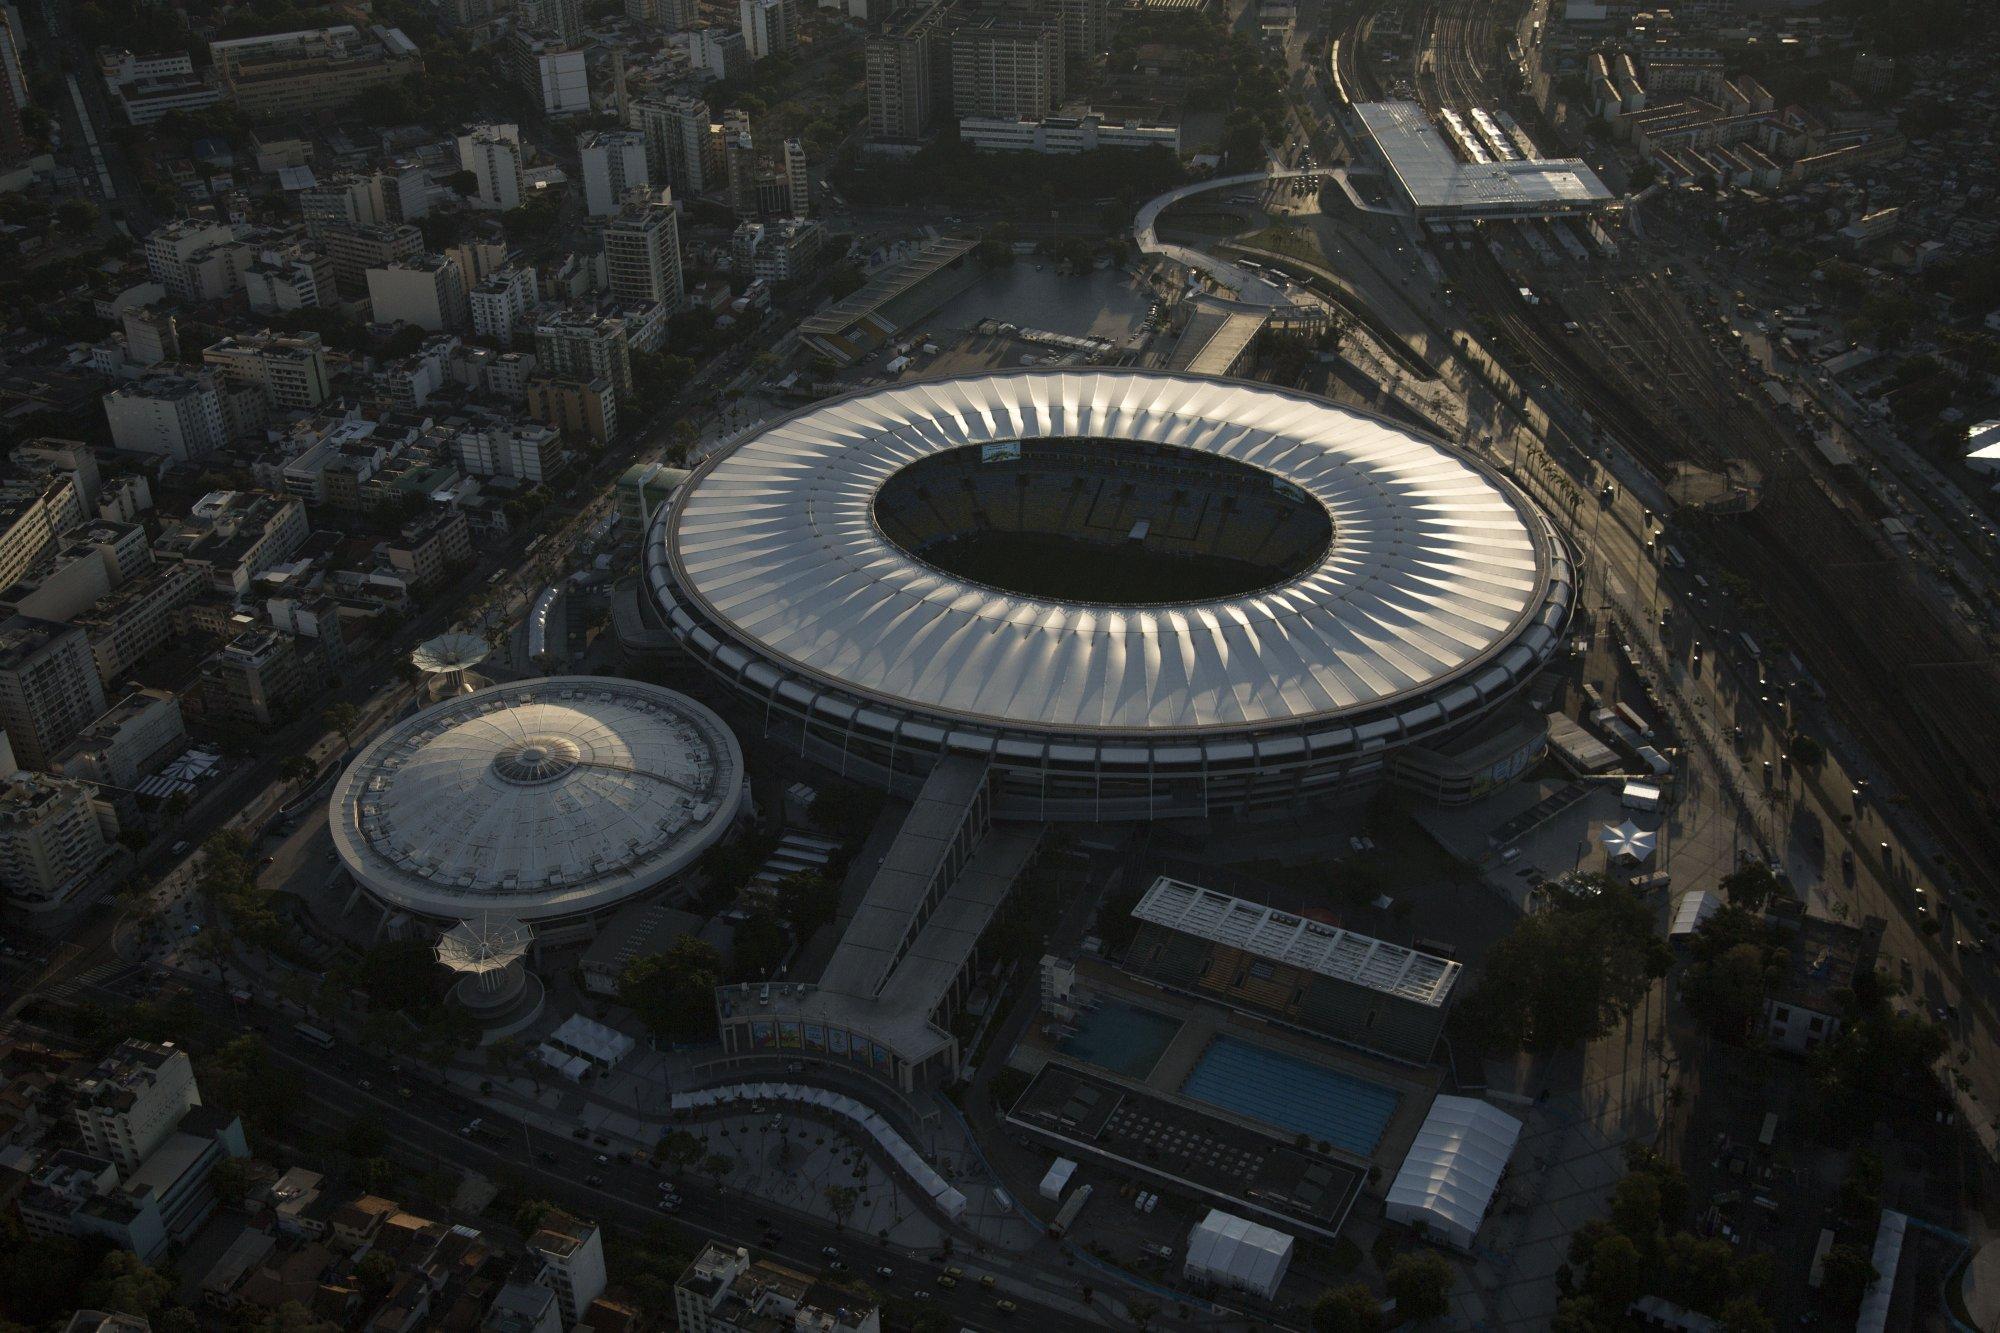 Rio government takes back control of Maracana stadium